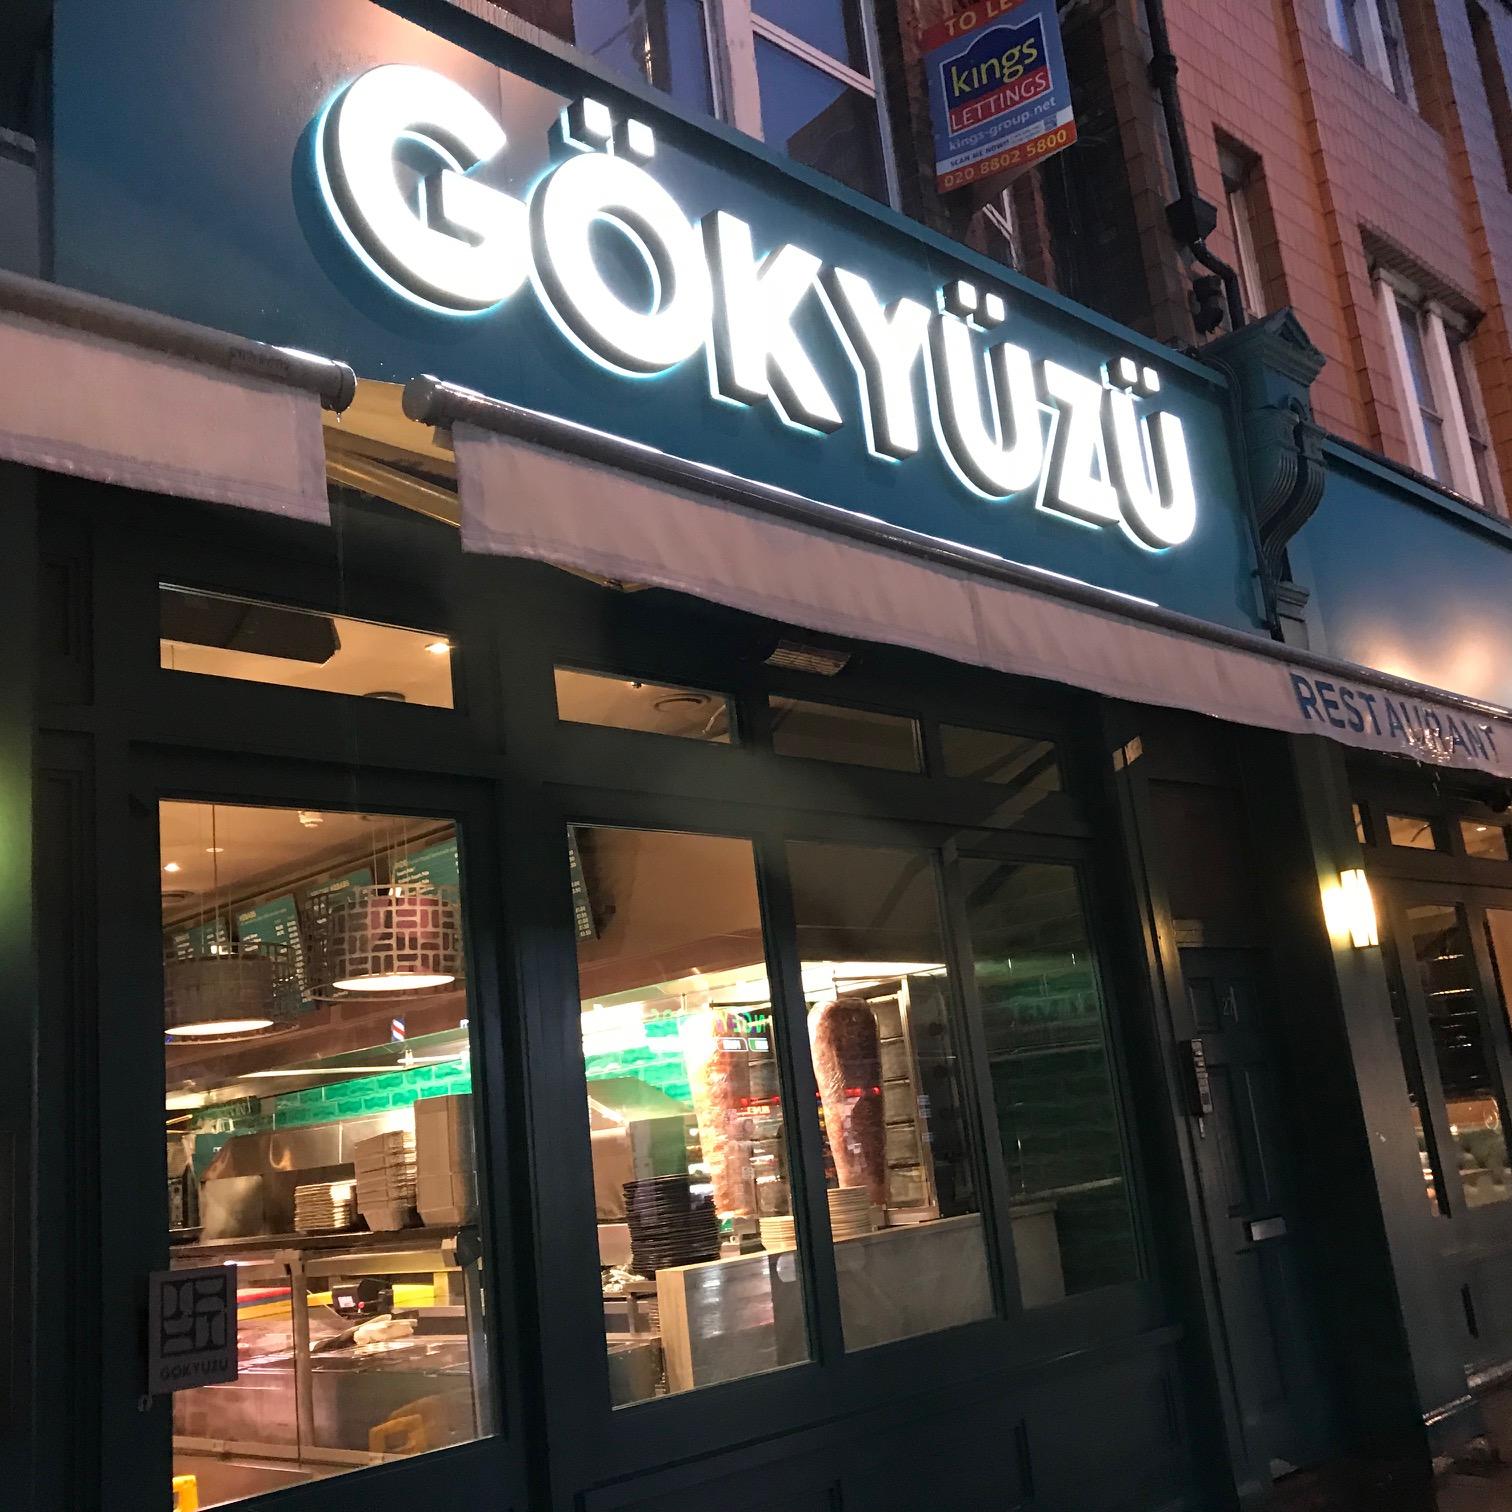 Gokyuzu Kebab London ロンドン ケバブ